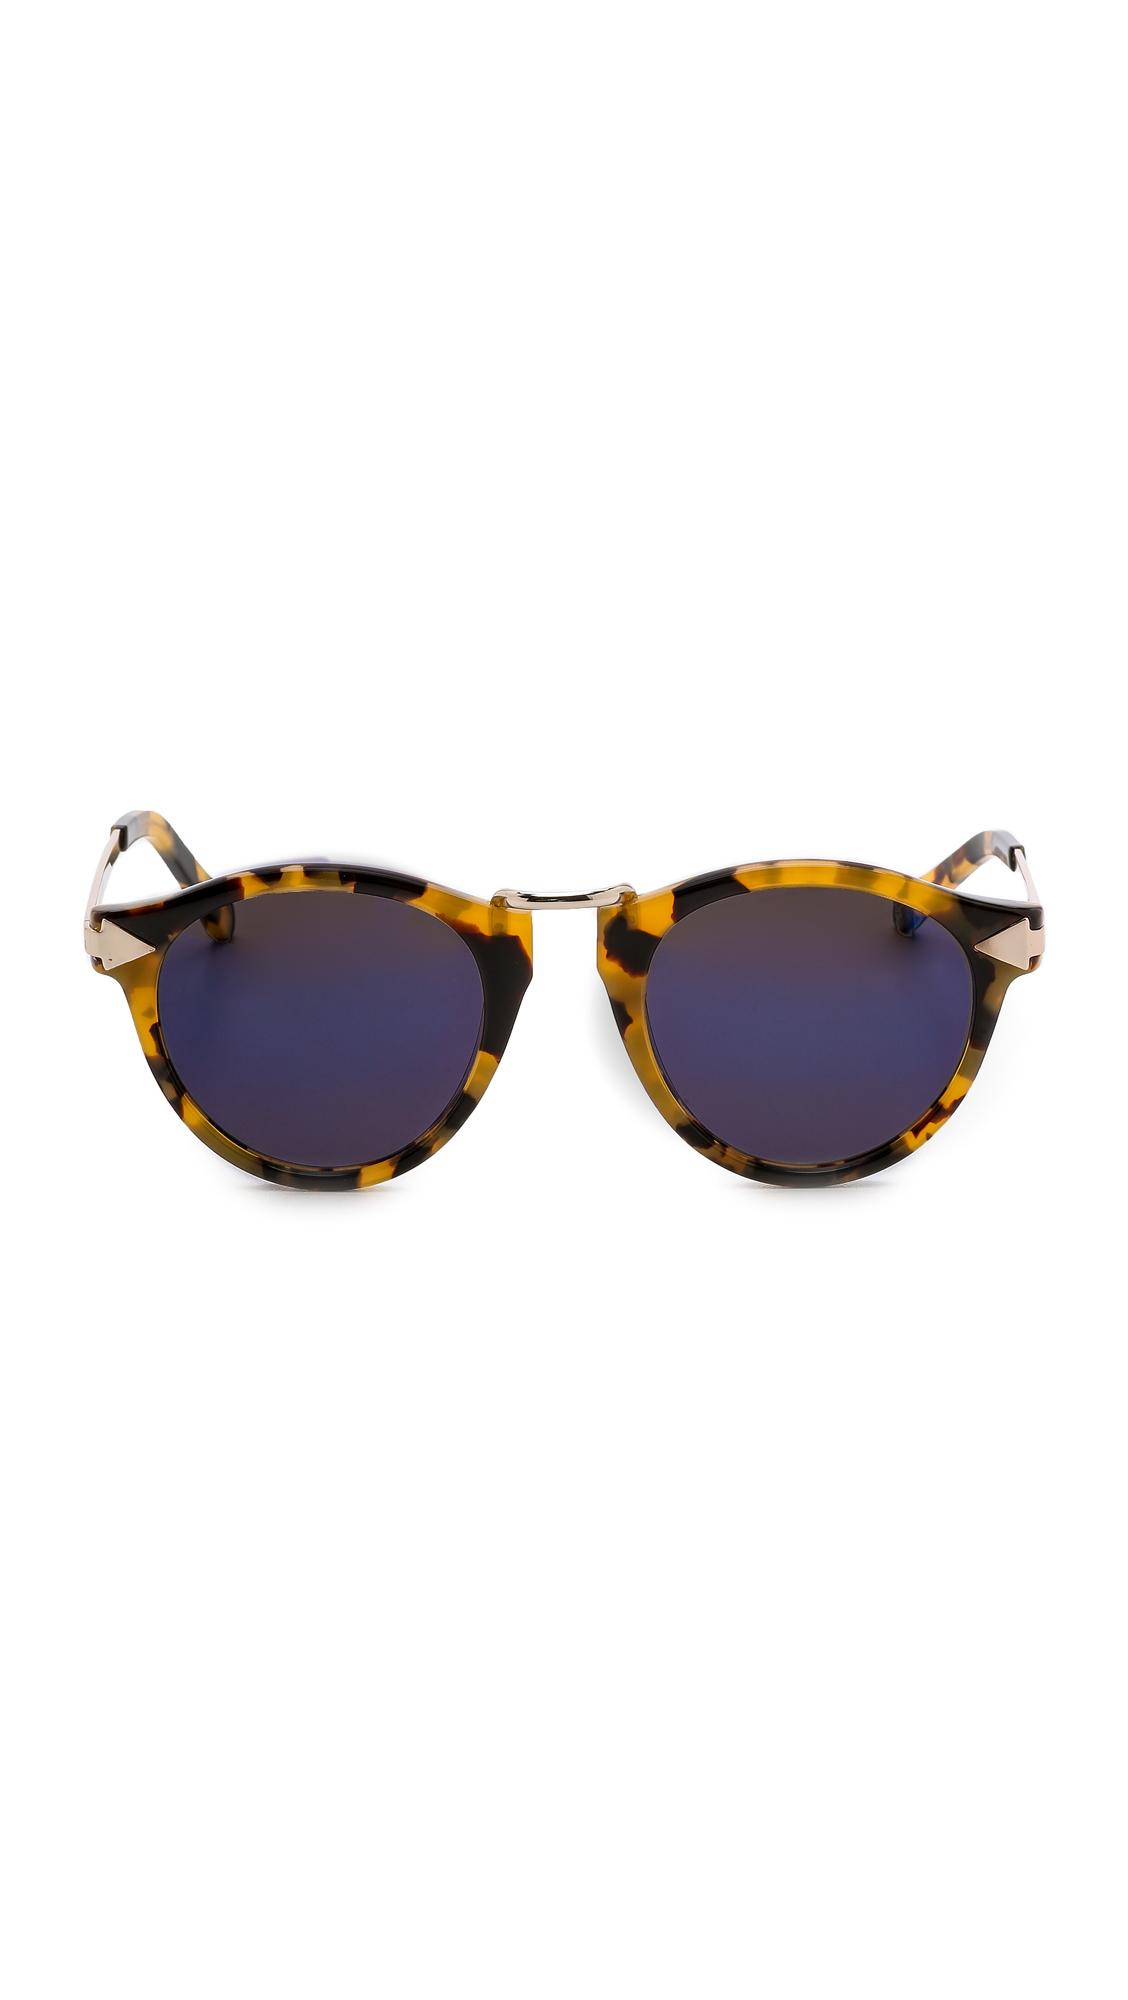 Karen Walker Mirrored Sunglasses  karen walker superstars collection helter skelter mirrored